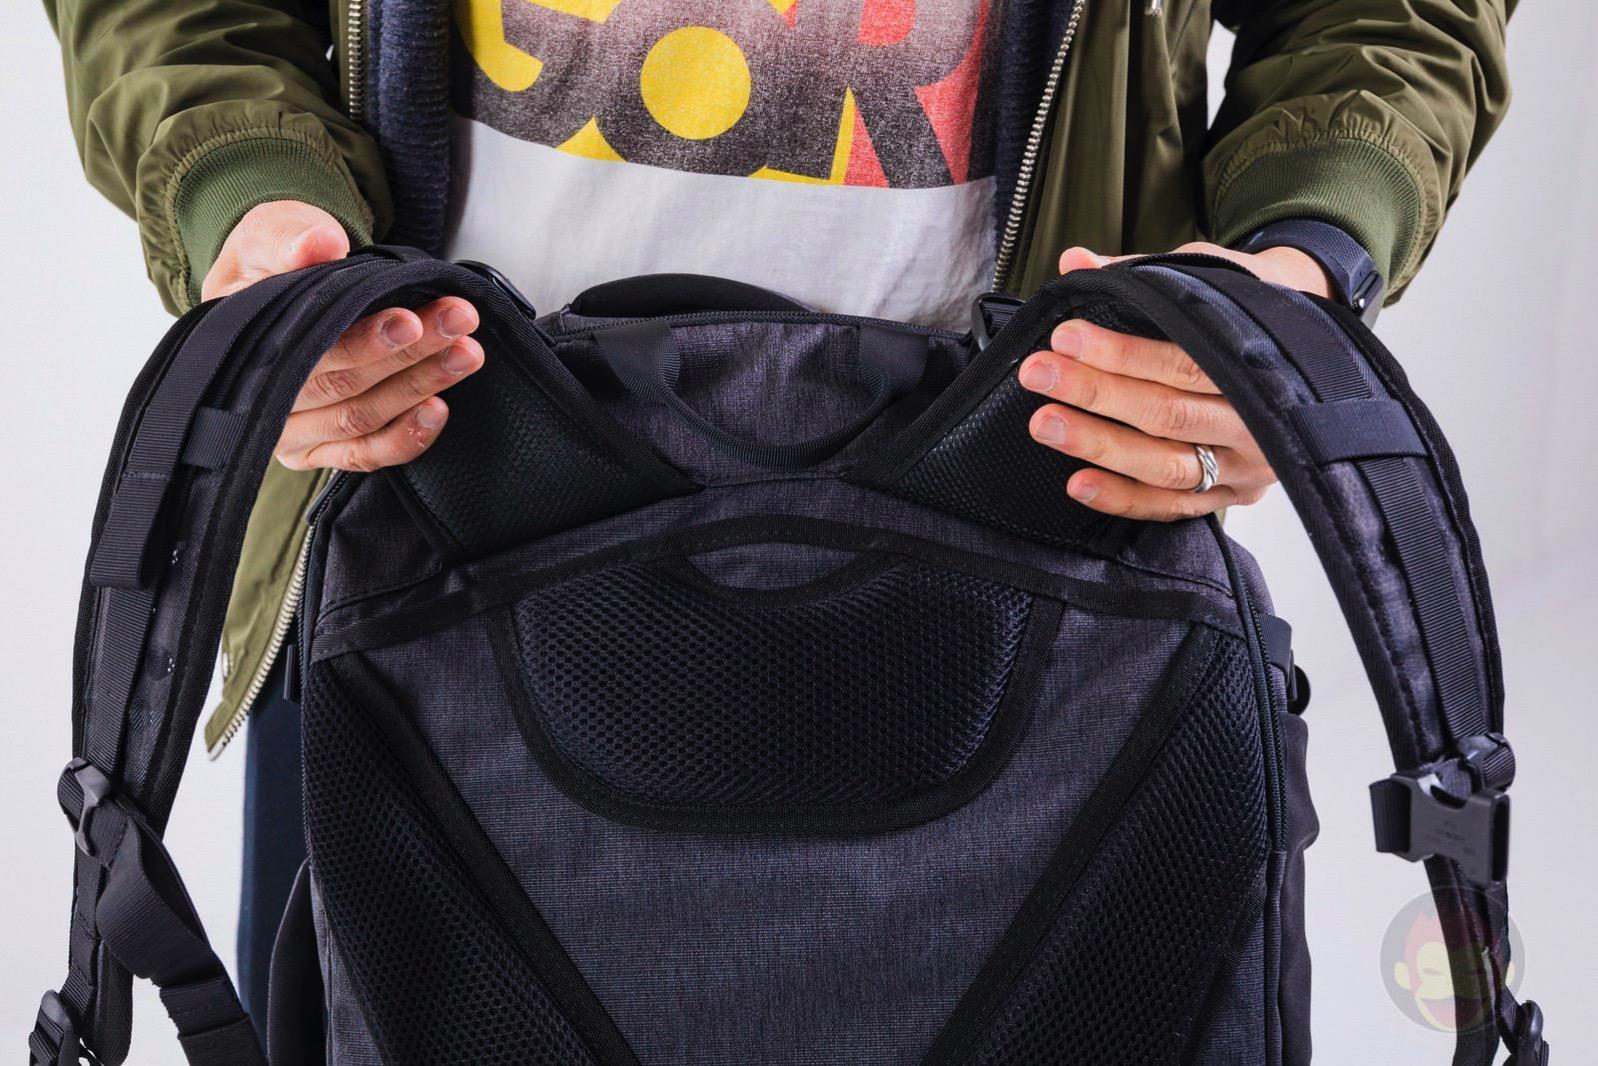 Tortuga-Setout-Backpack-35liter-review-35.jpg